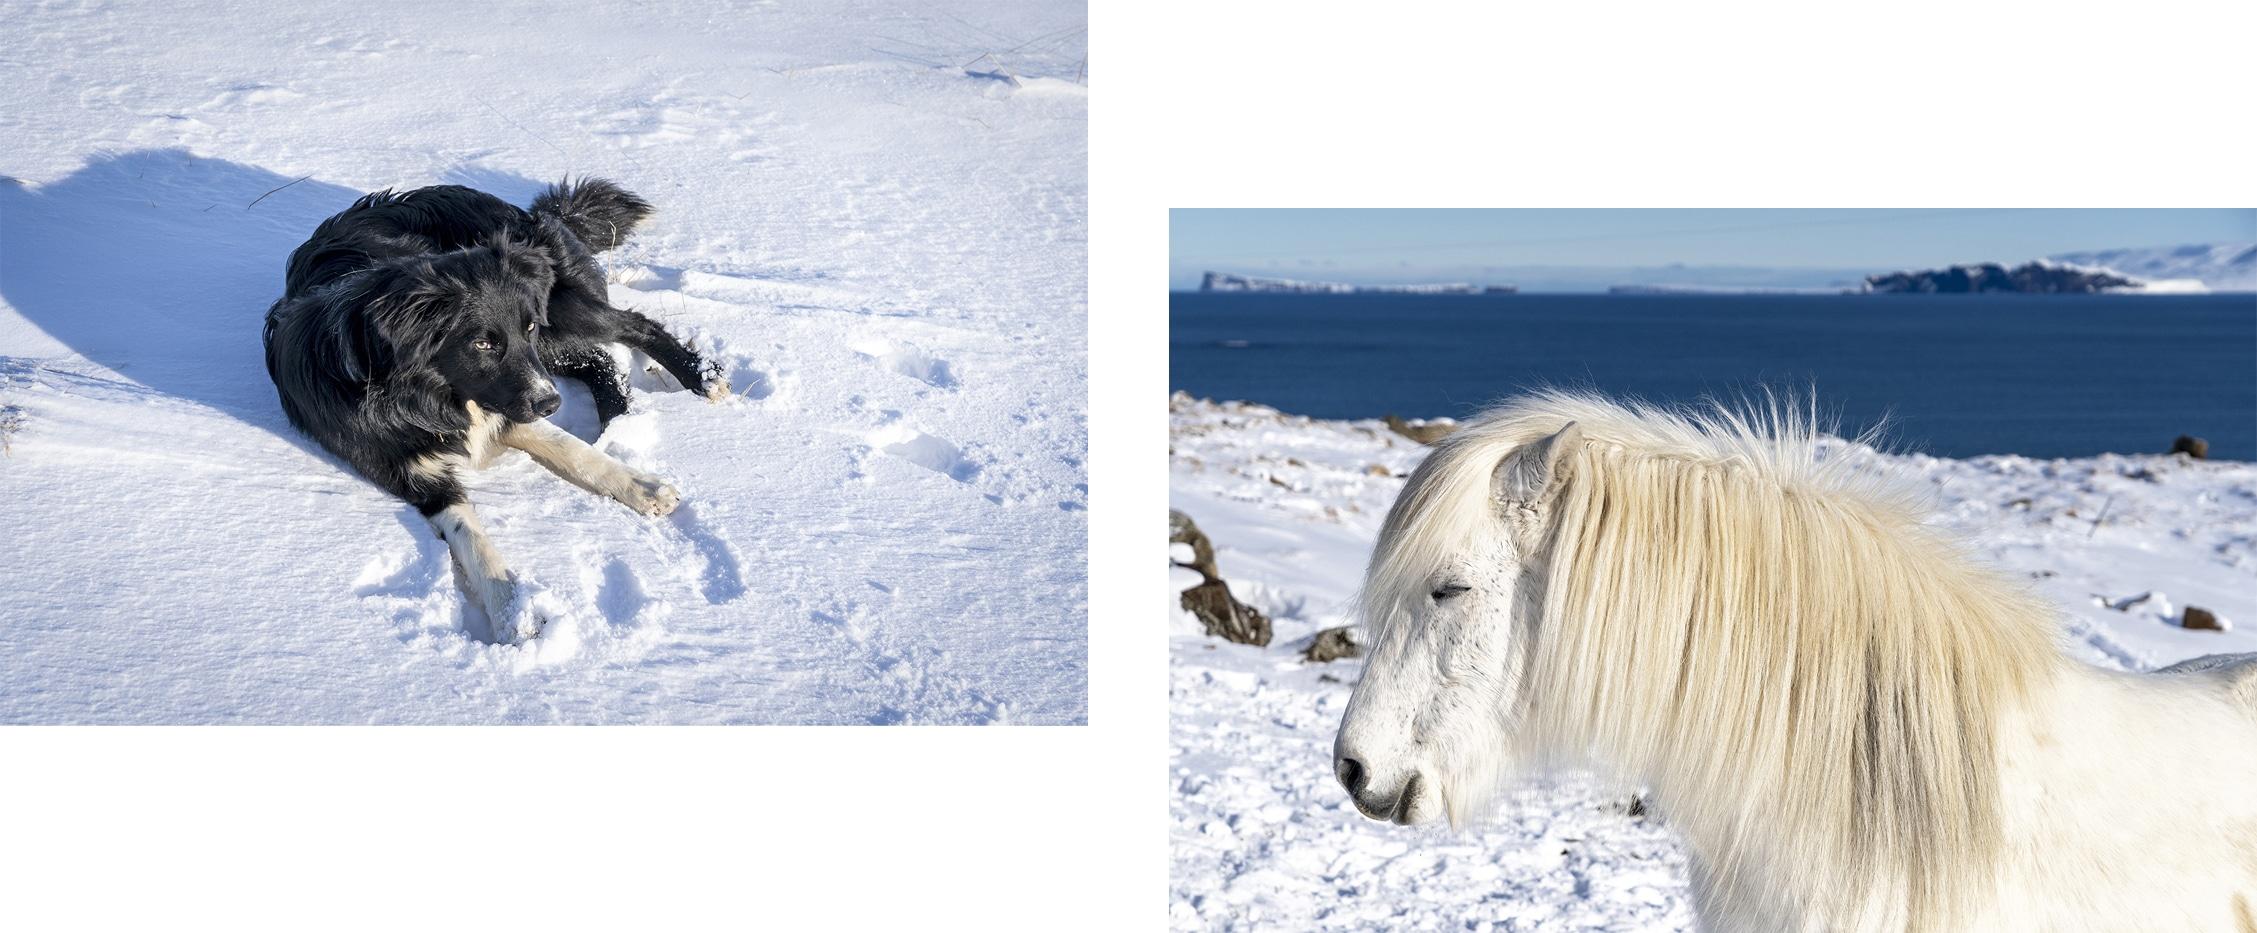 Tindastóll Islande cheval chien